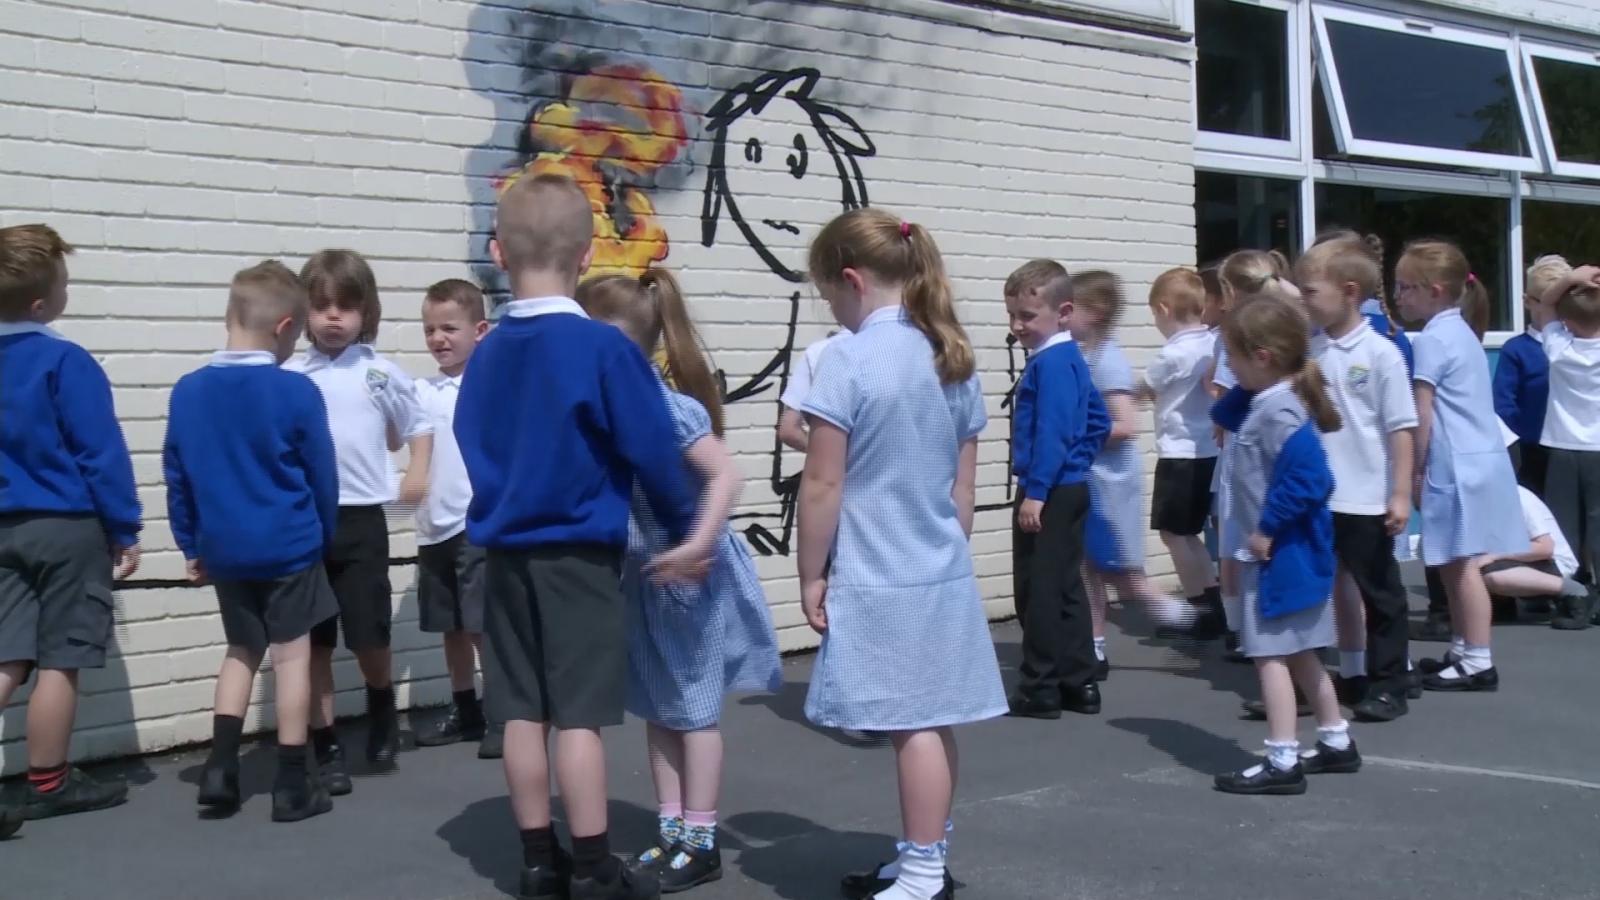 Banksy surprises primary school